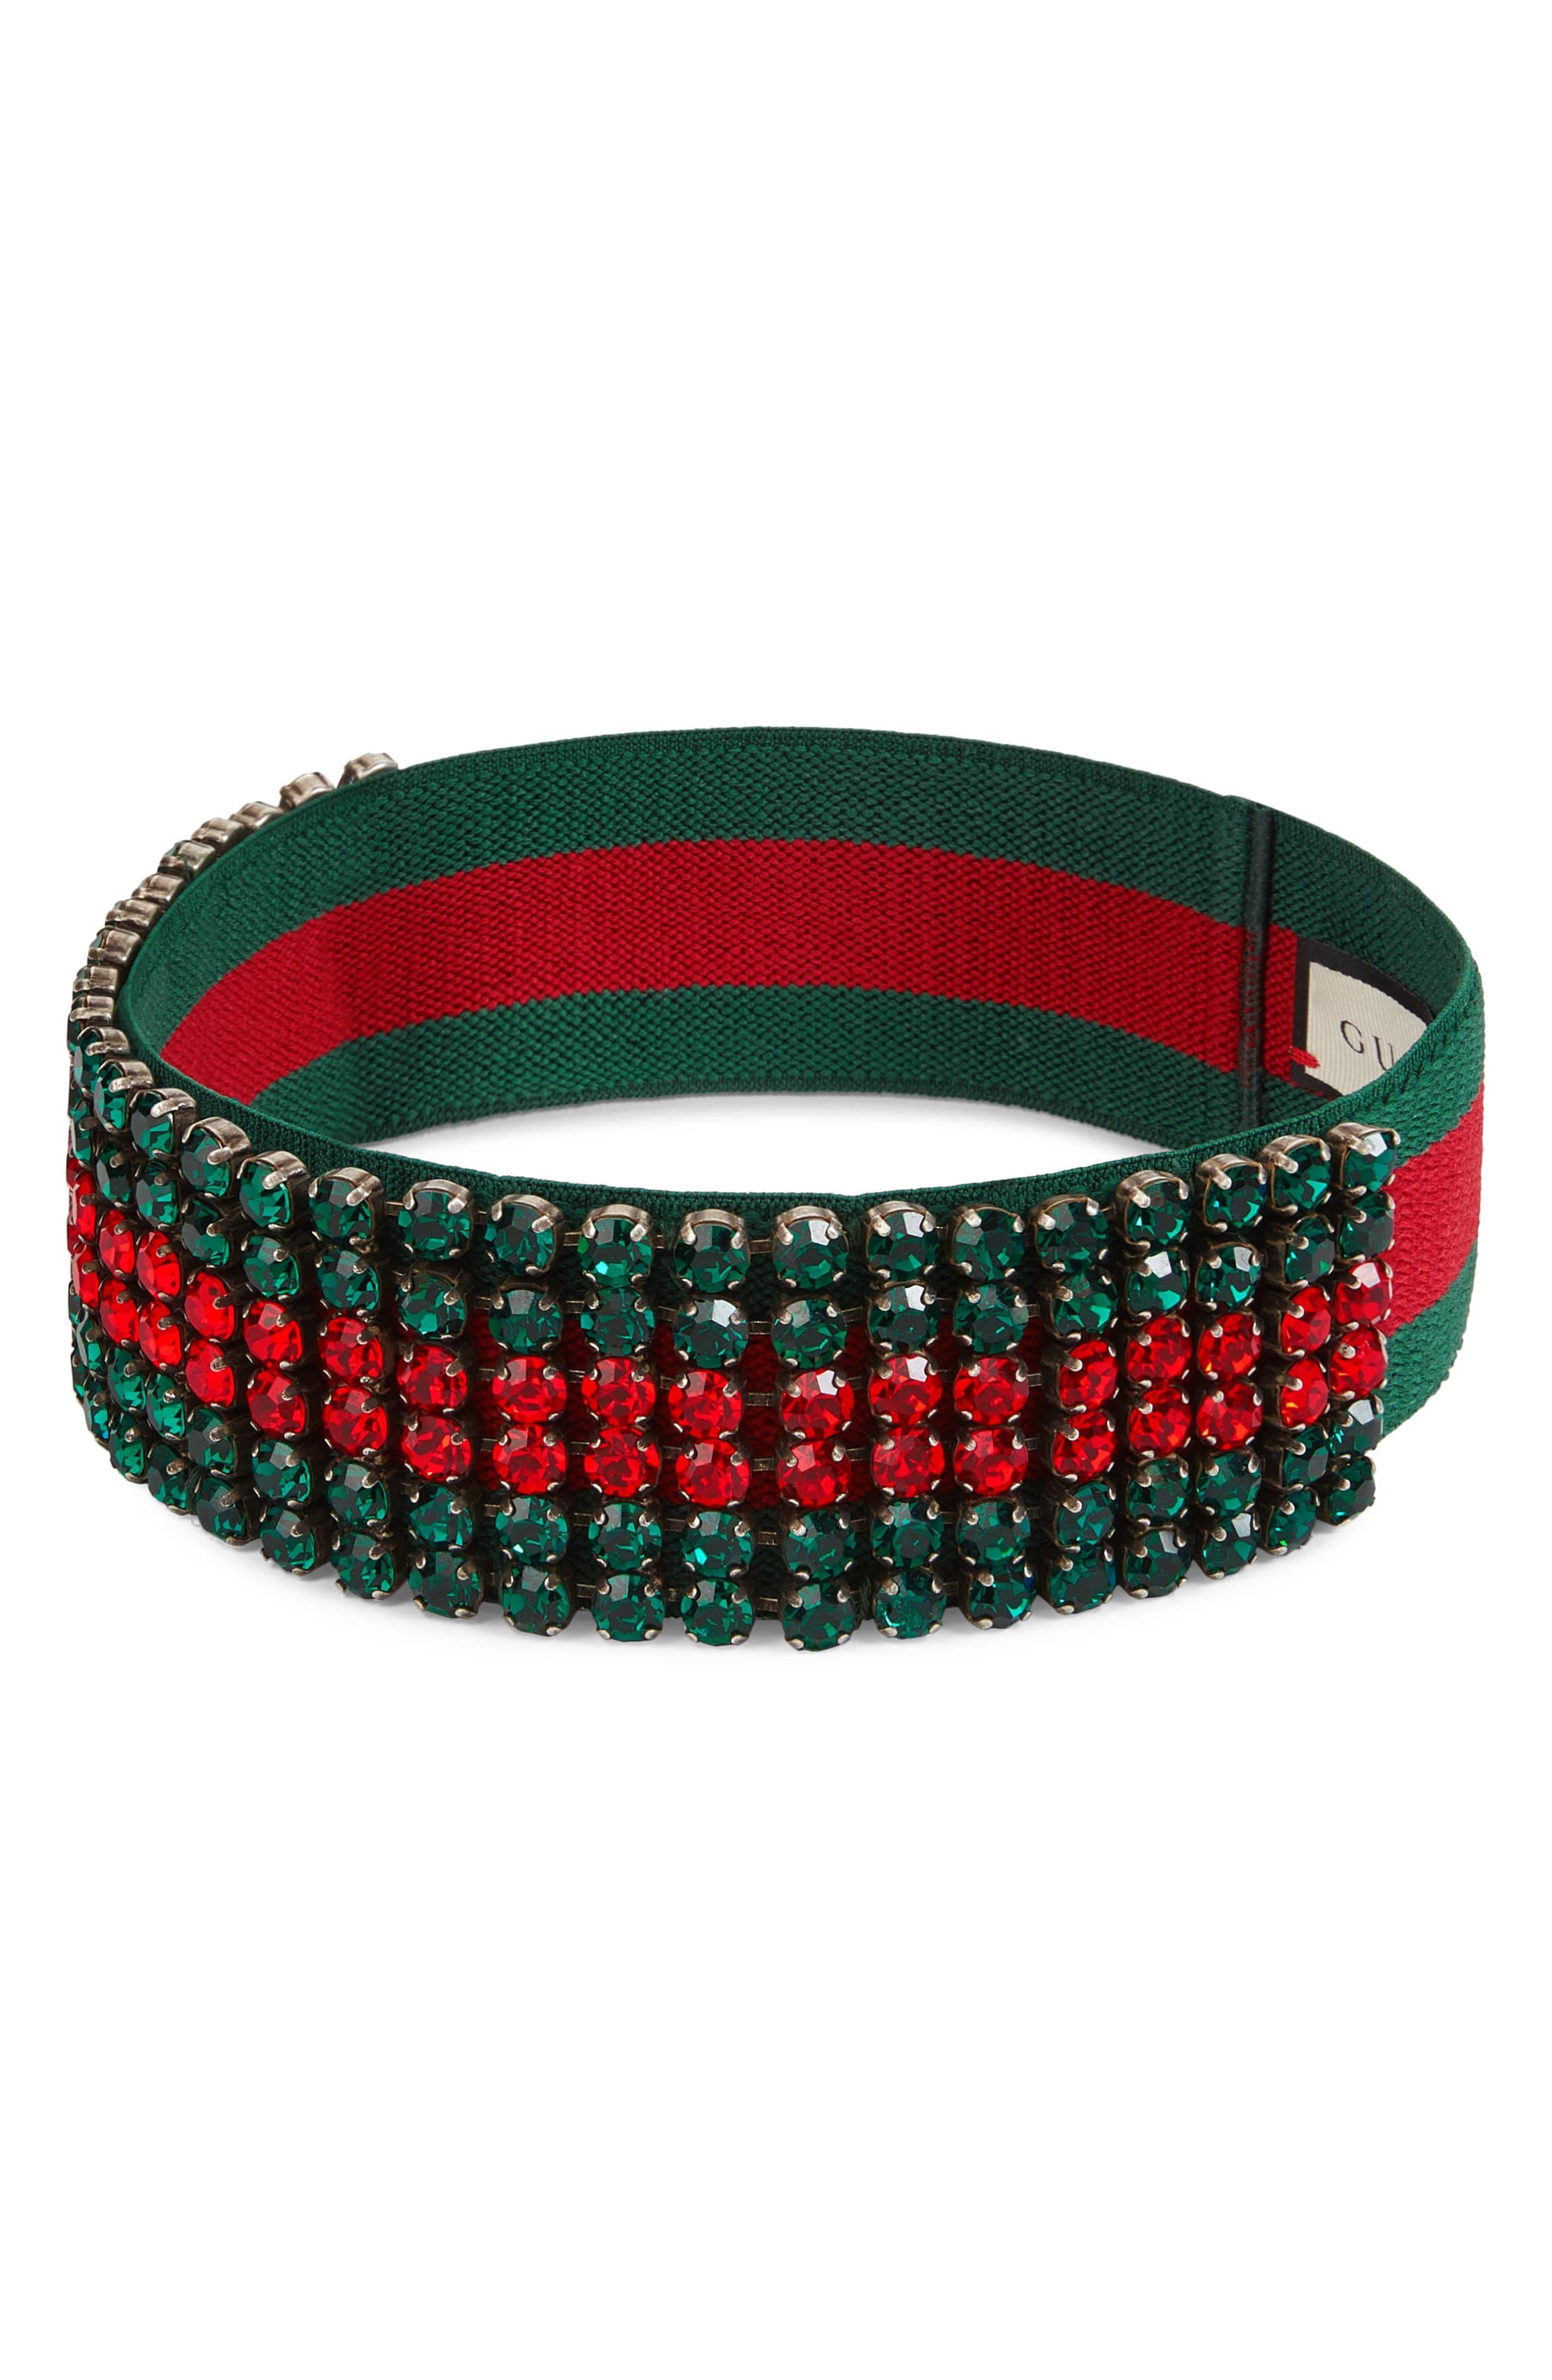 Webby Crystal Headband,                         Main,                         color, RED/ DARK GREEN